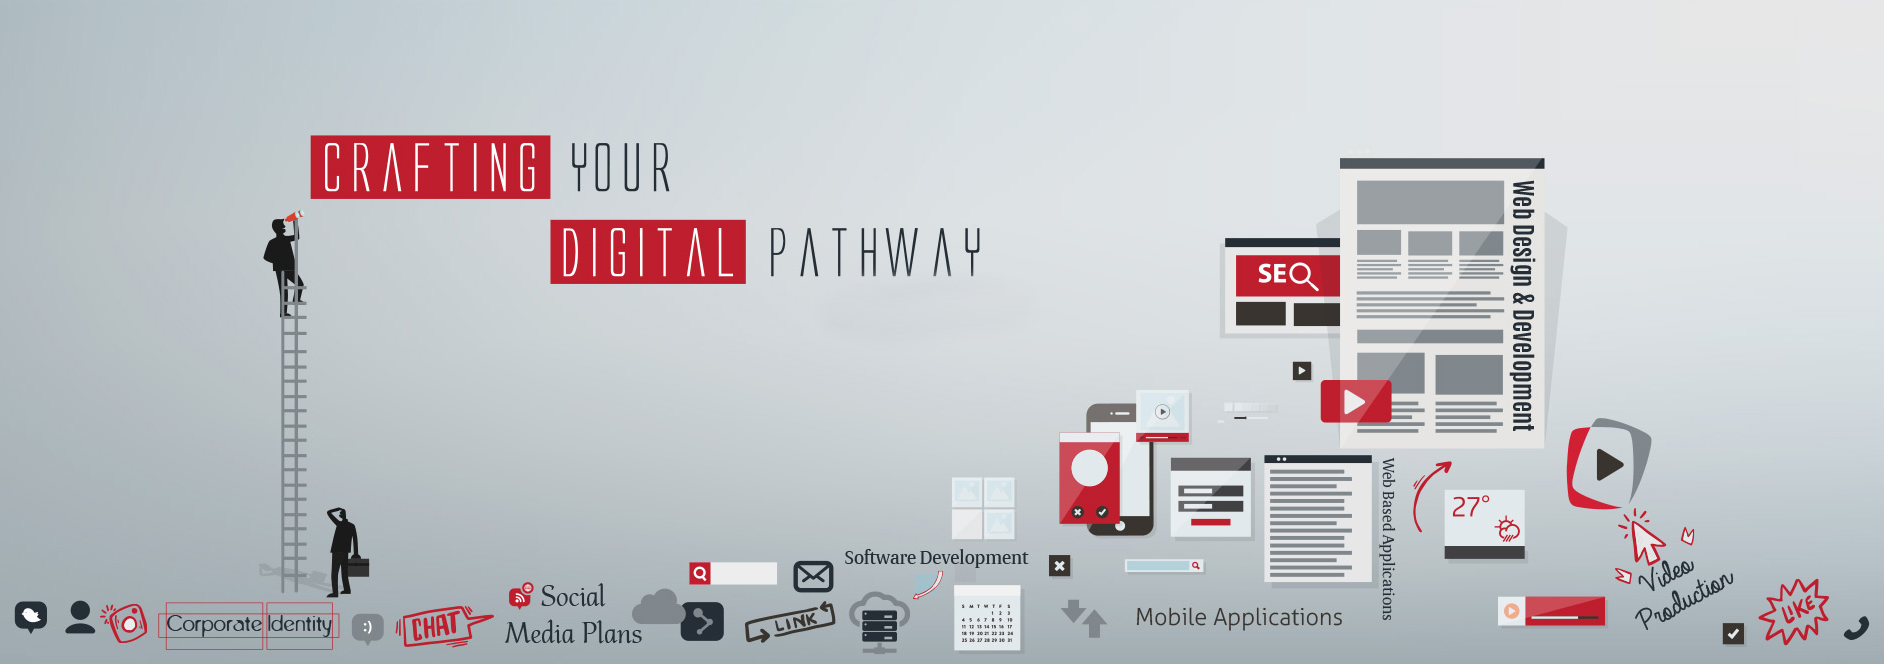 Digital Agency or a Technology Company 2018 | Krify